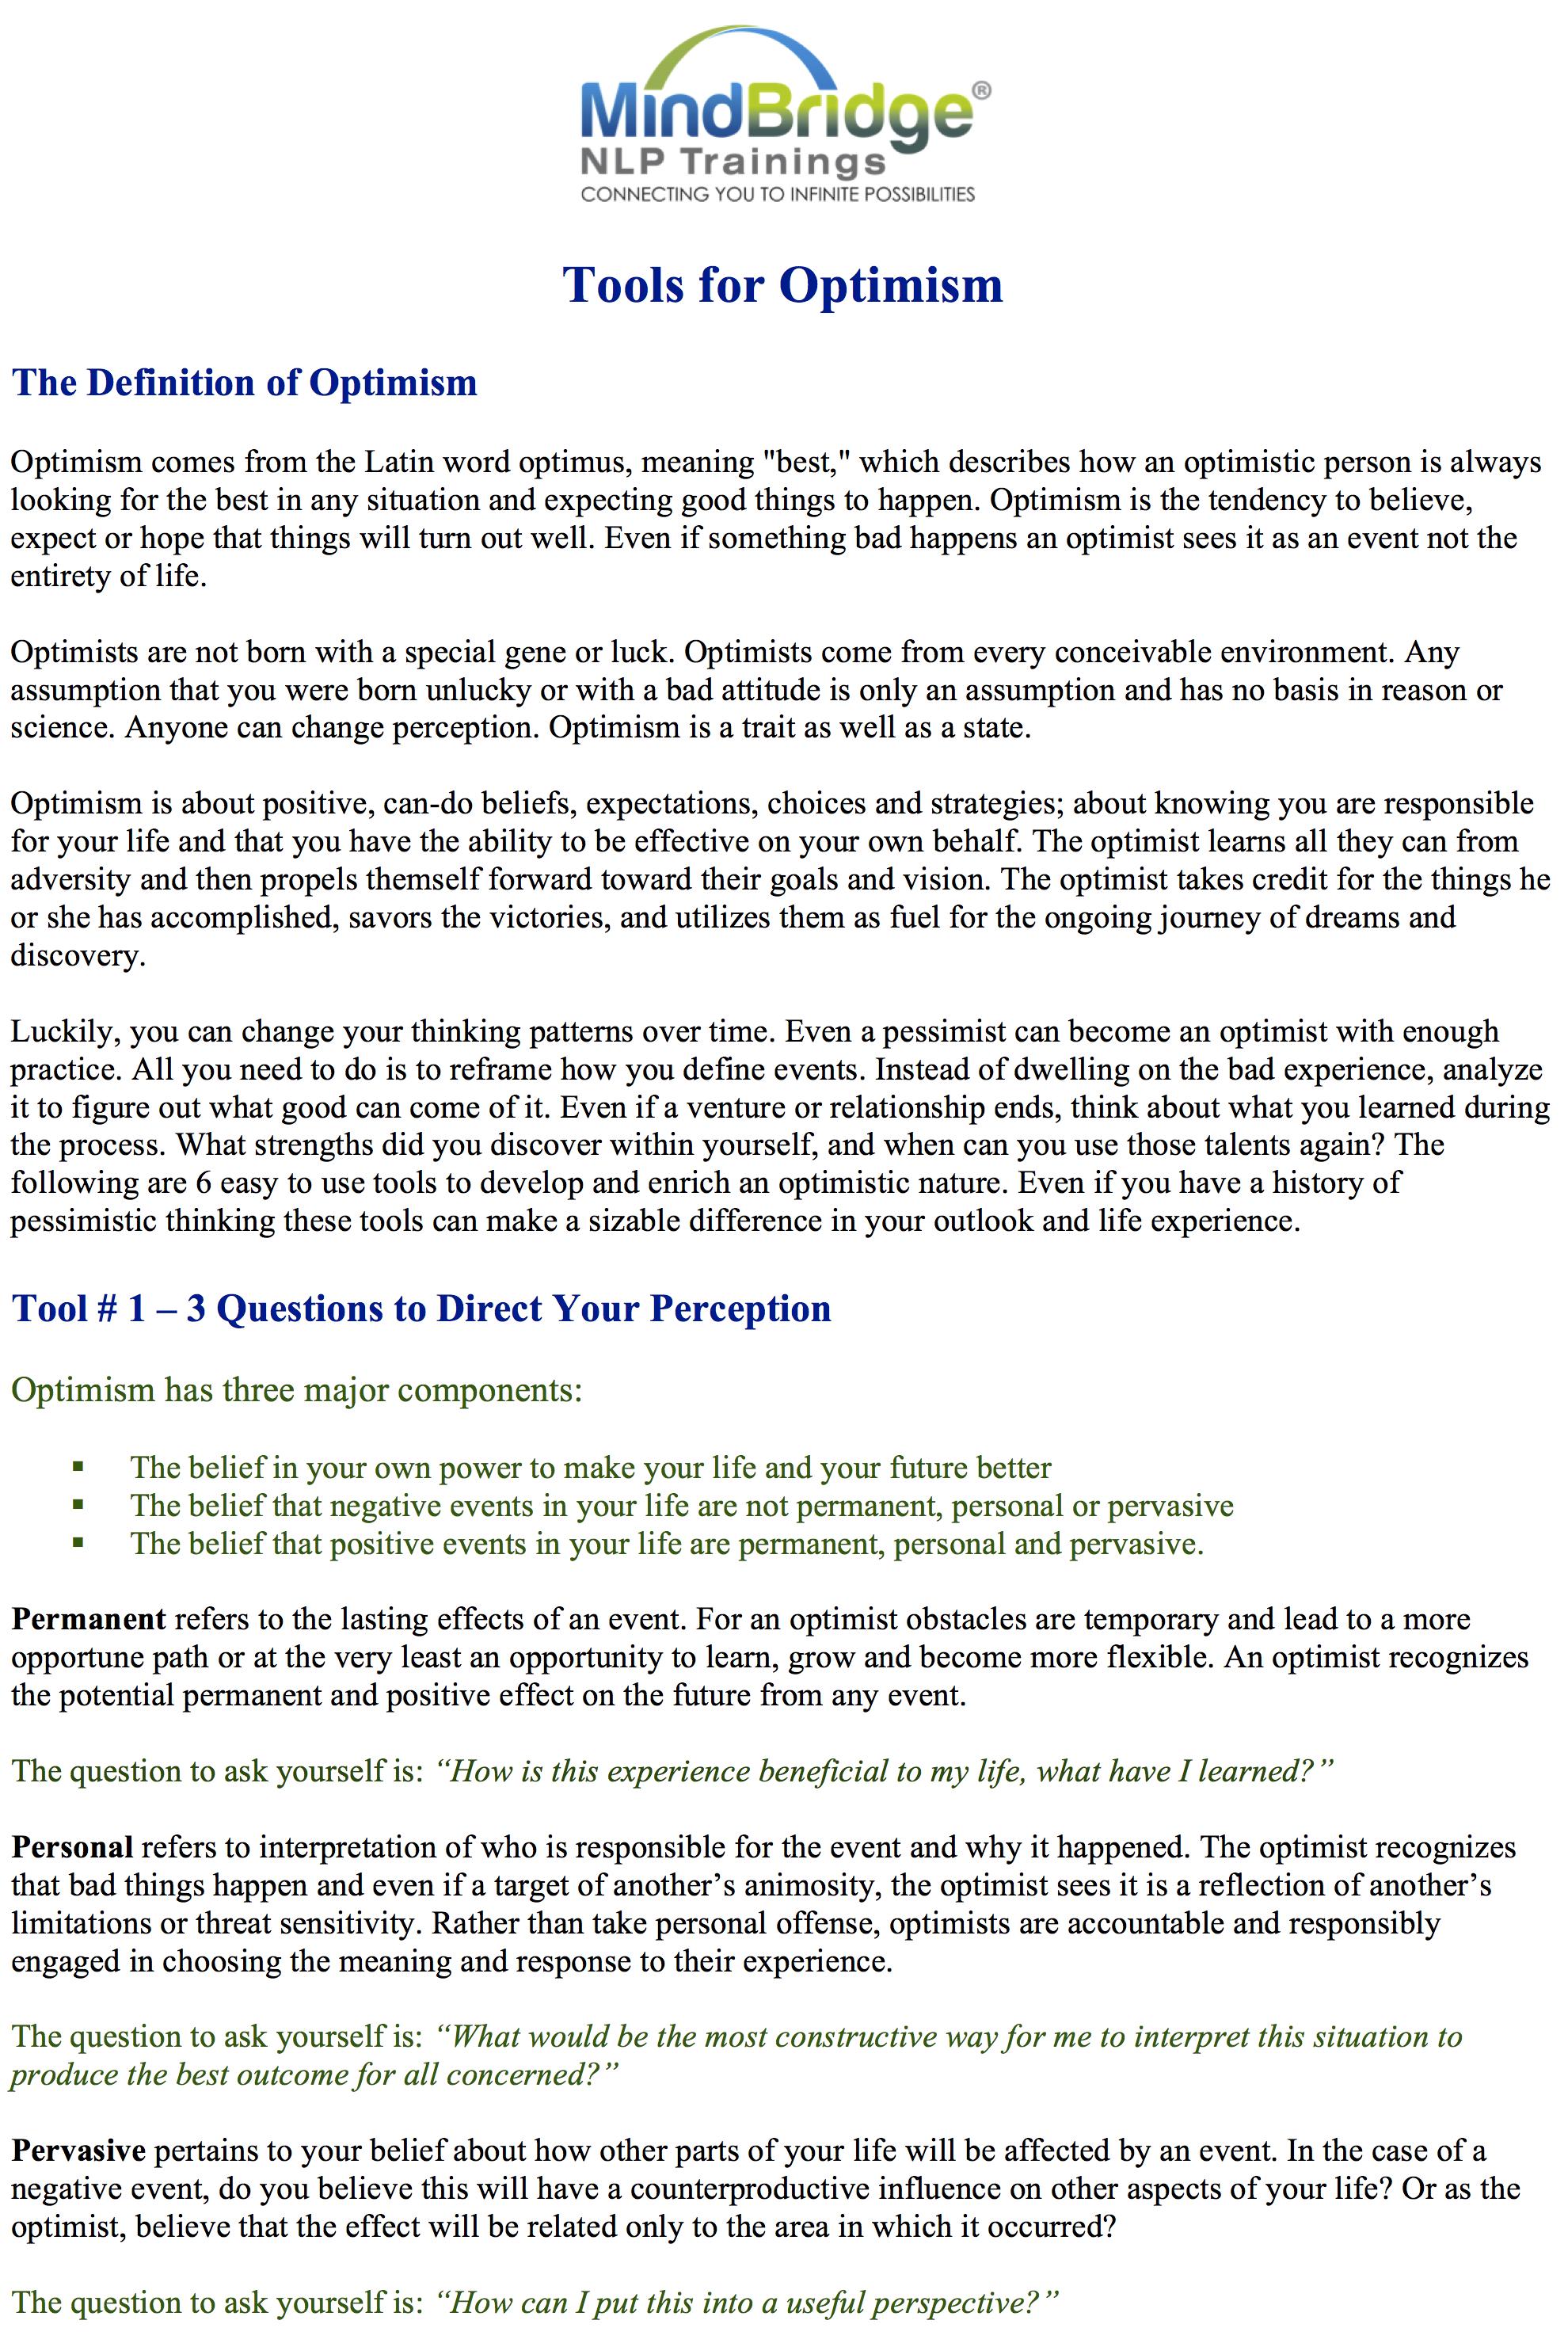 Tools for Optimism1 – Mindbridge NLP Coach Certification Trainings